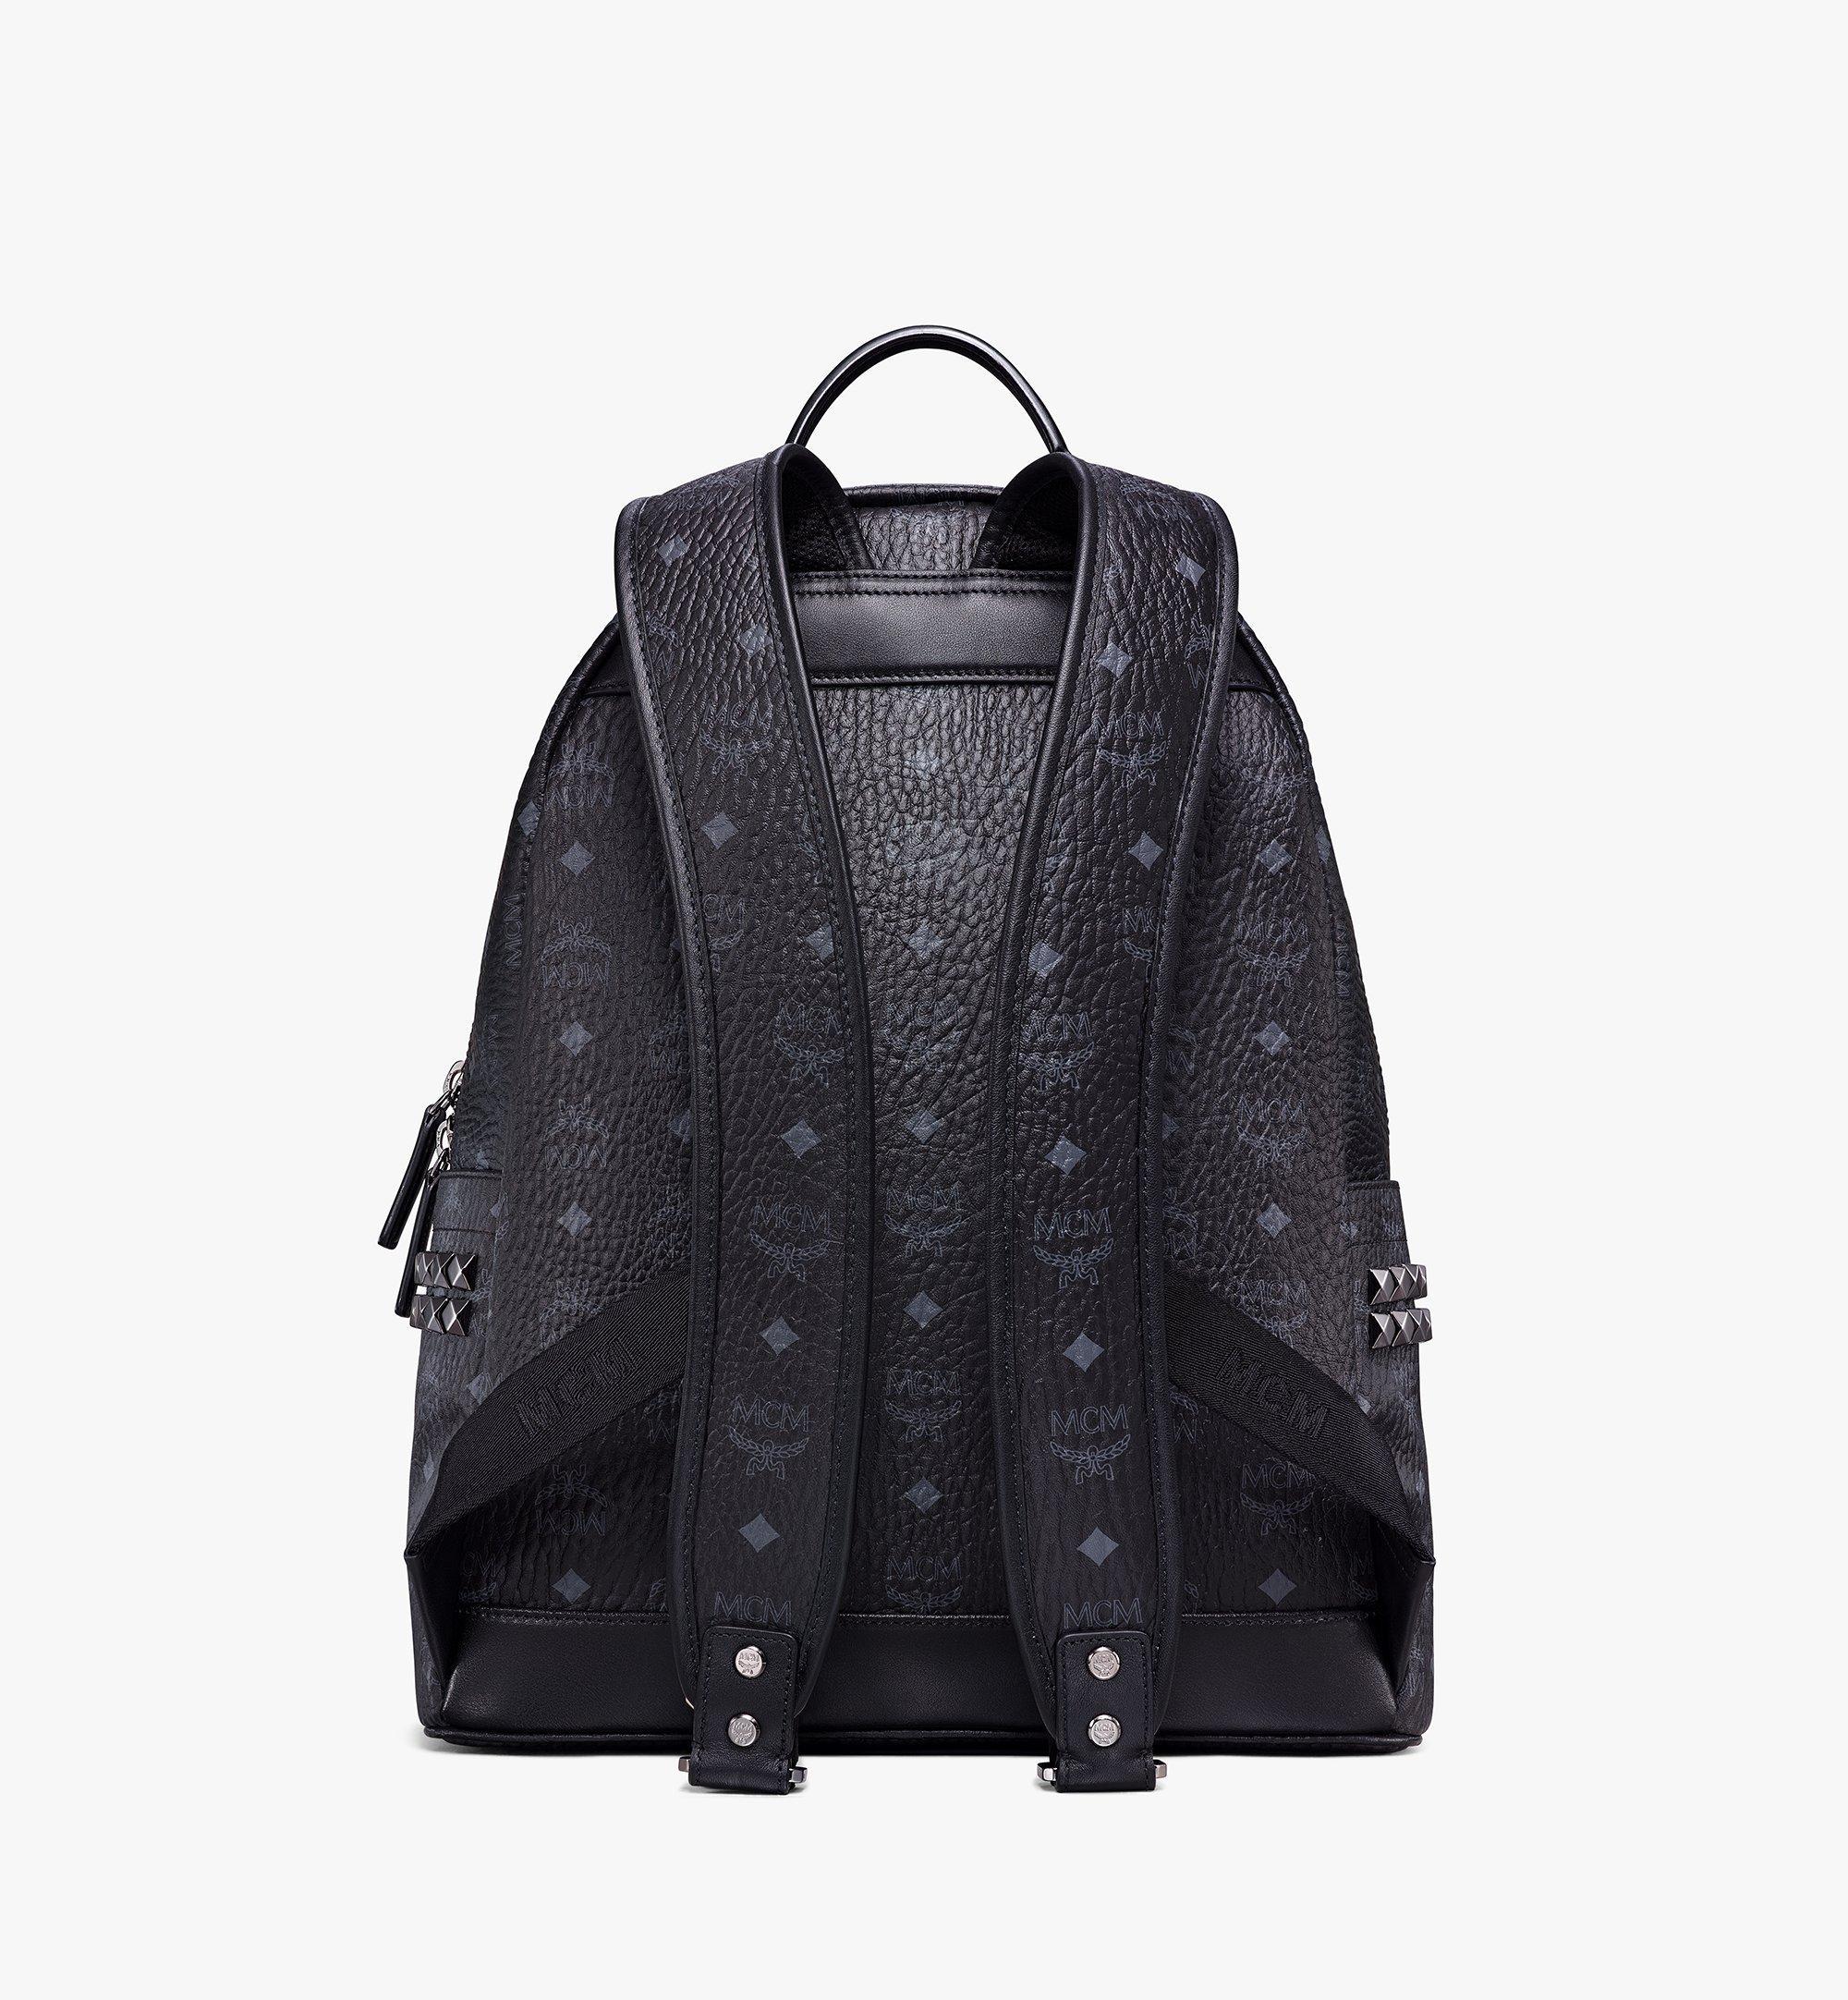 MCM Stark Side Studs Backpack in Visetos Black MMK6SVE38BK001 Alternate View 3